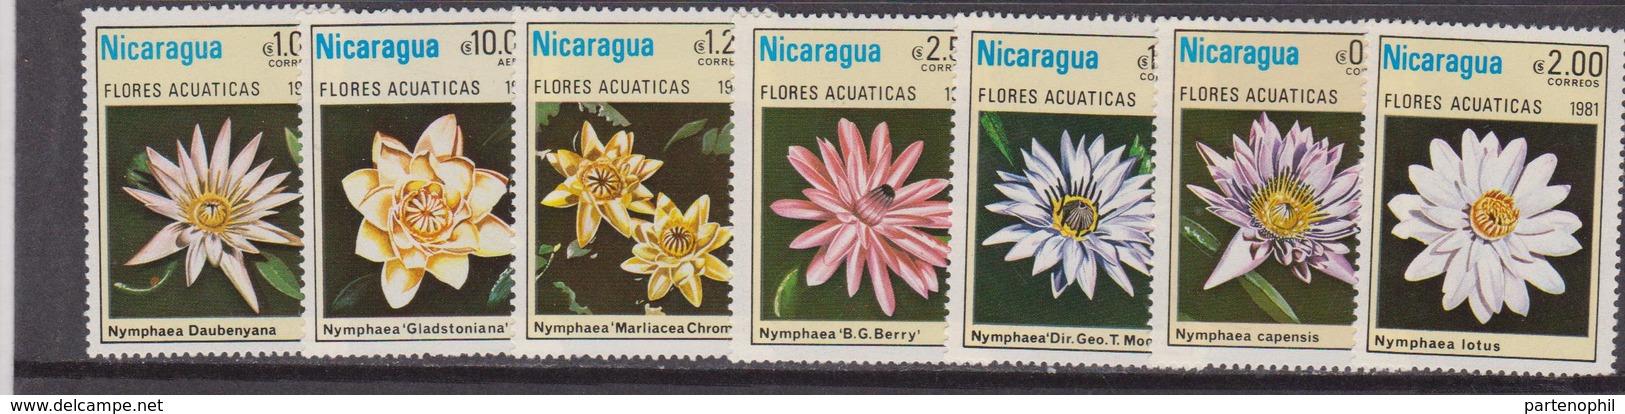 NICARAGUA 1981 Fiori Flowers  - MNH Set - Nicaragua